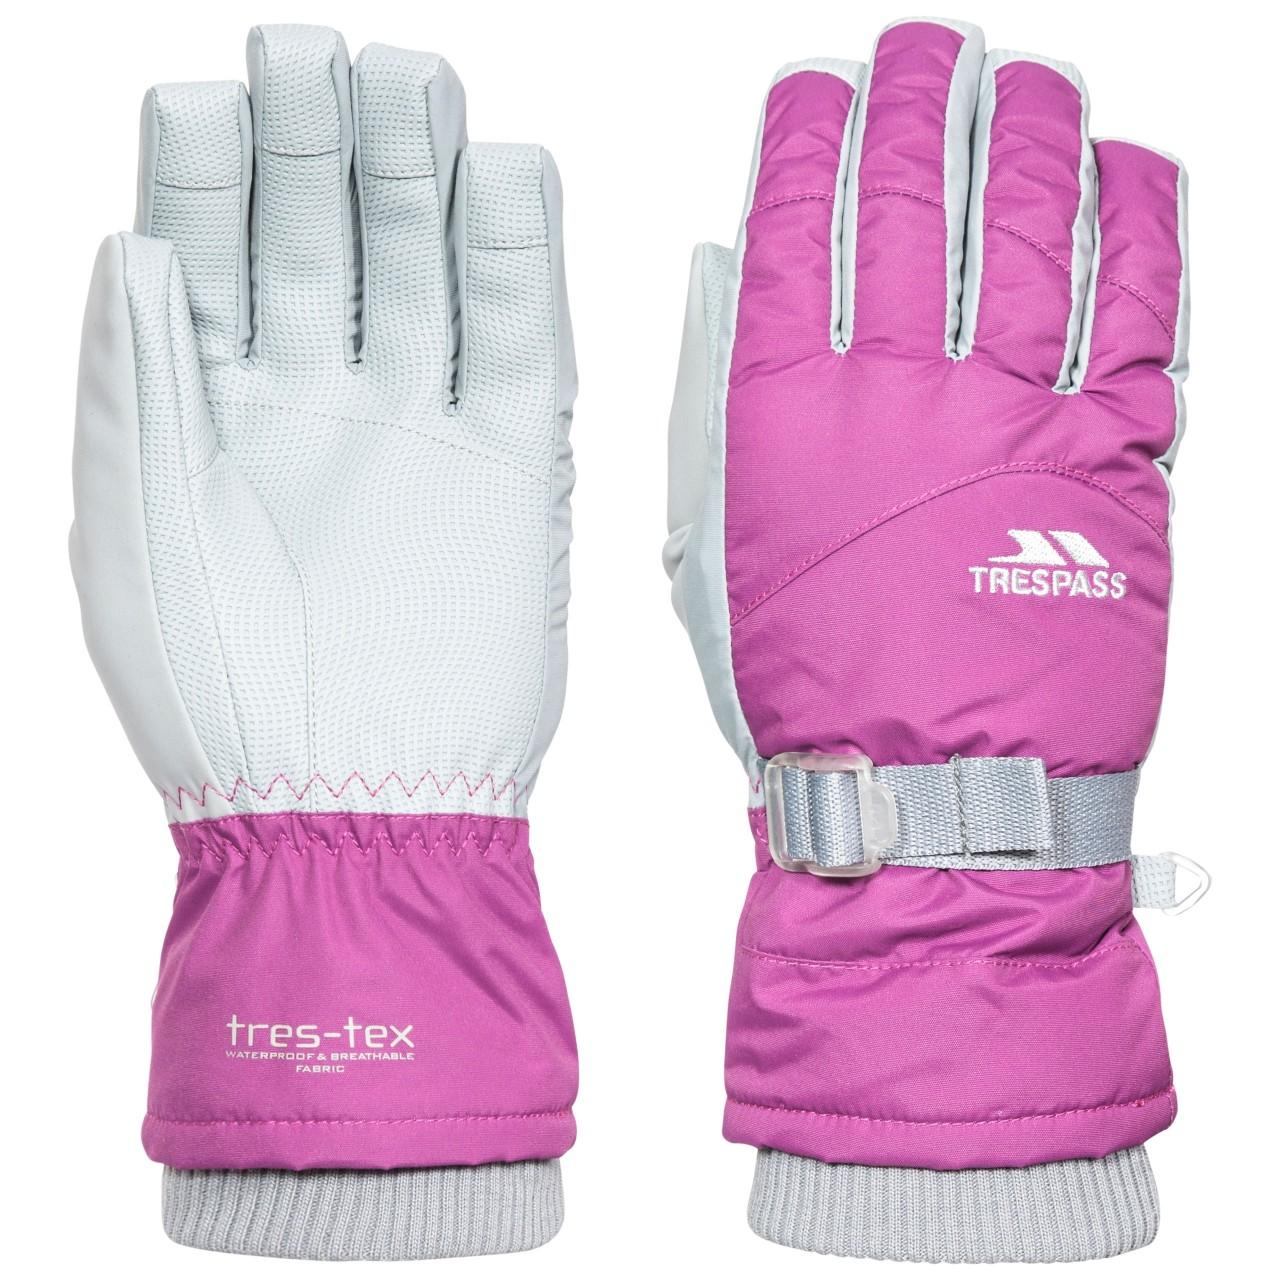 Trespass Womens/Ladies Vizza II Gloves (S) (Purple Orchid)